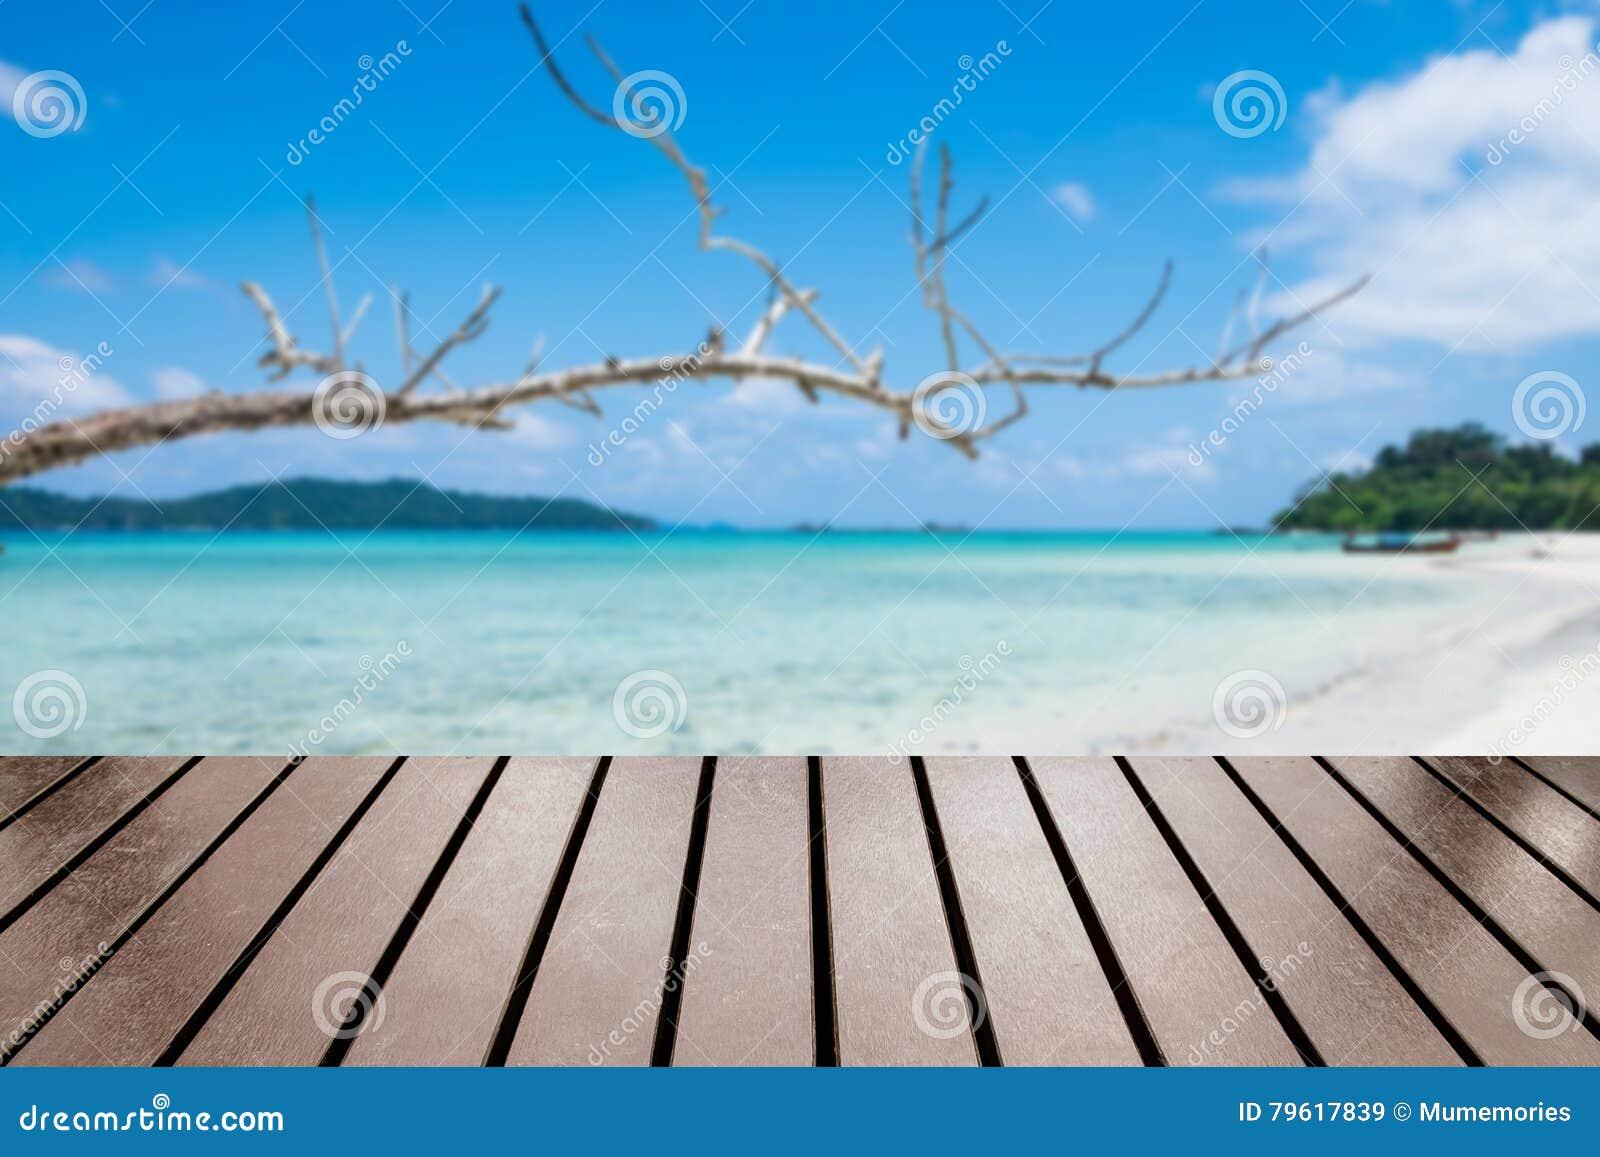 Tabela de madeira na praia do mar